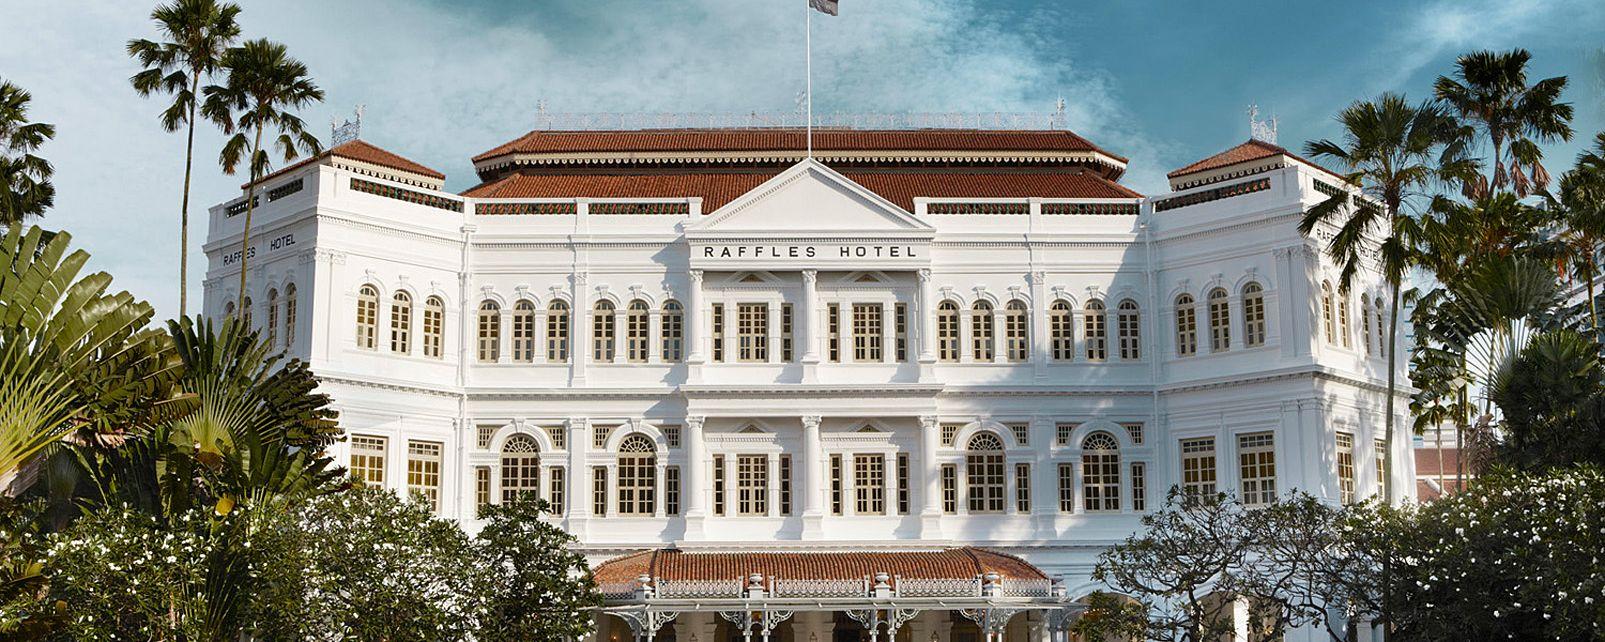 Hôtel Raffles Singapore